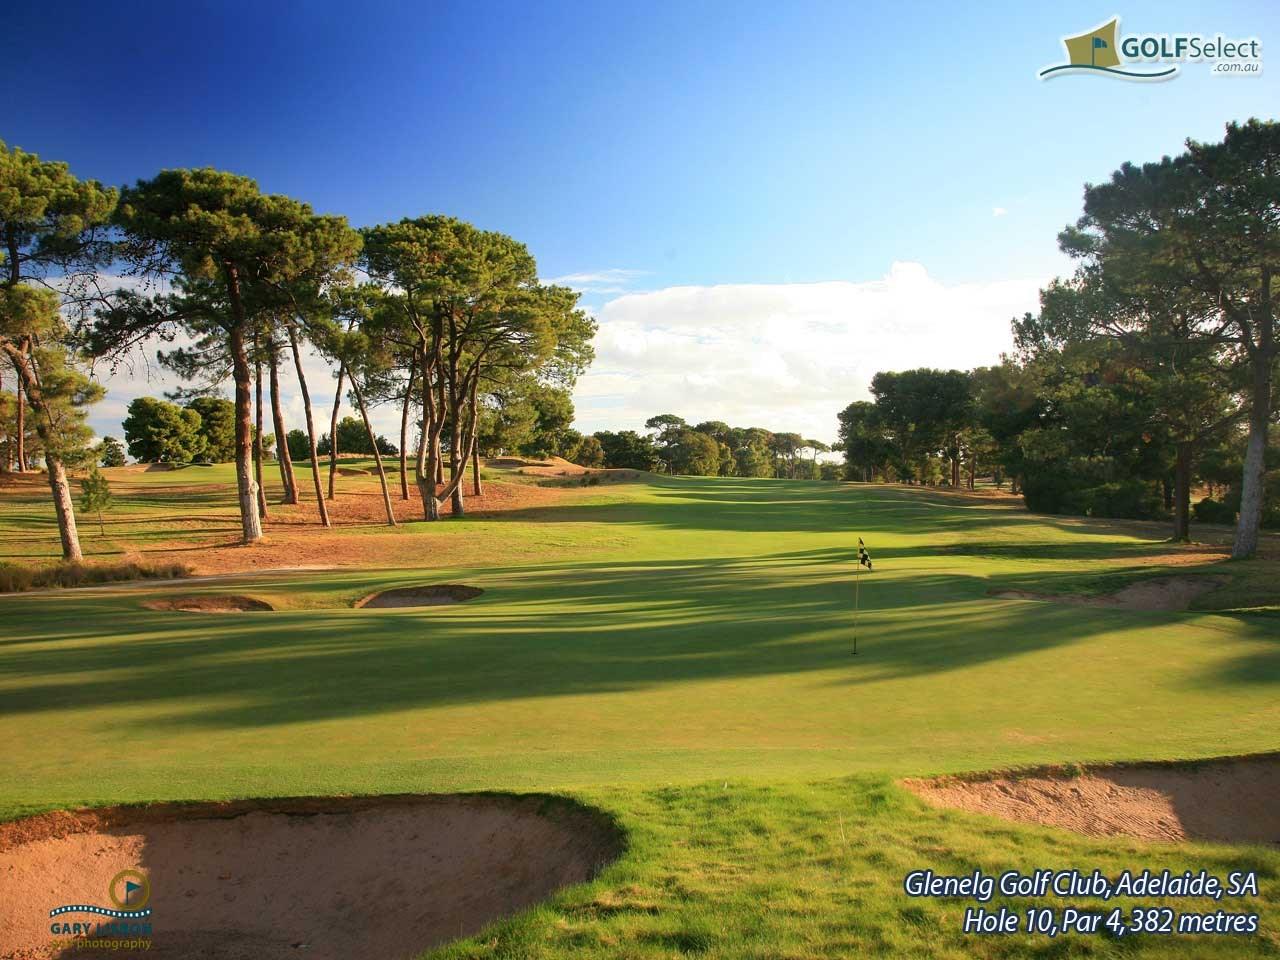 glenelg golf club novar gardens south australia 5040. Black Bedroom Furniture Sets. Home Design Ideas